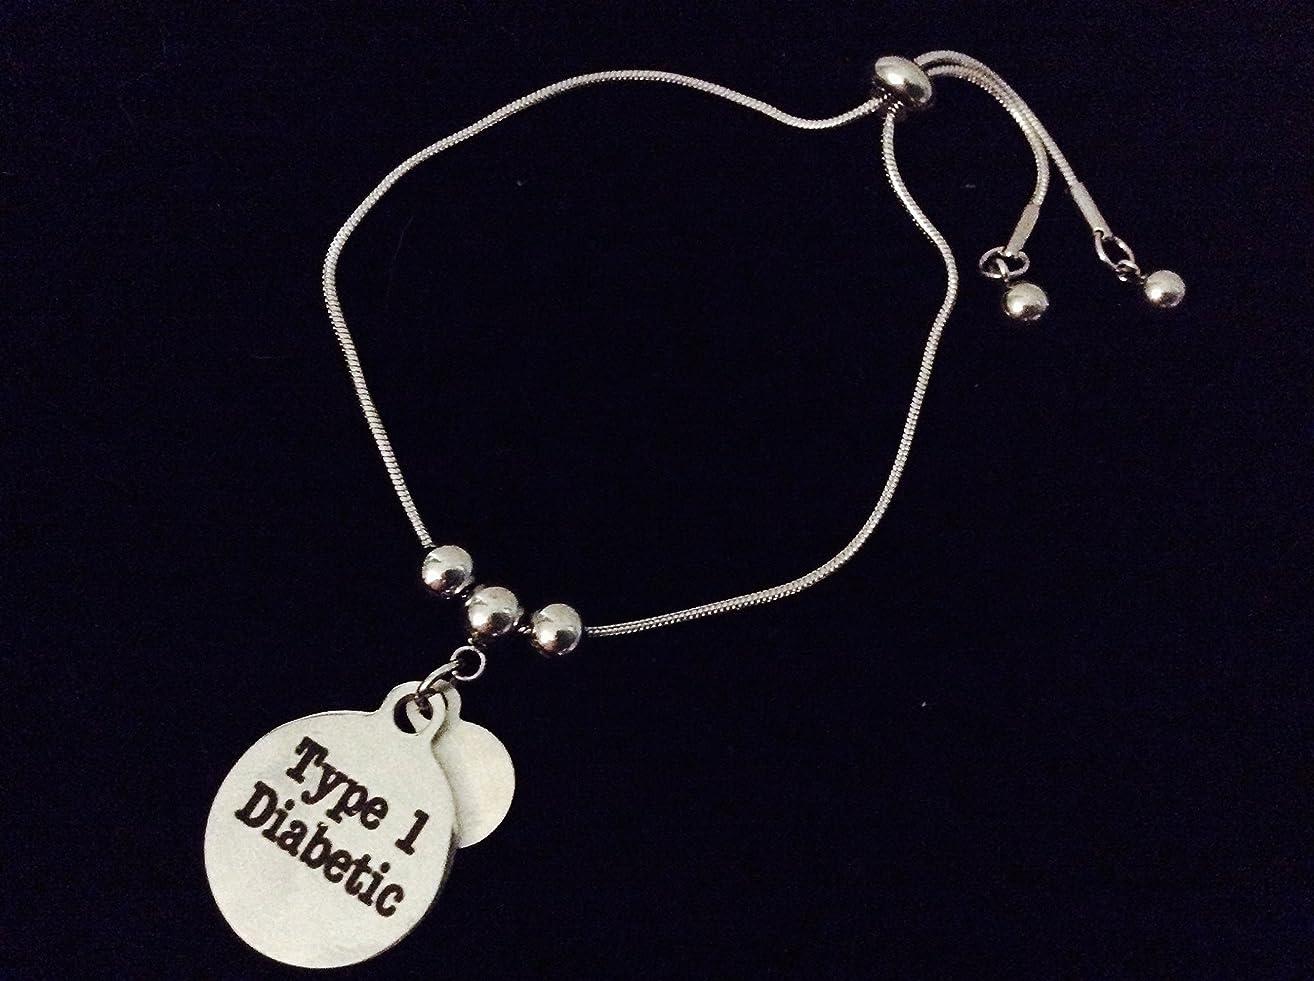 Diabetic Medical Alert Type 1 Type 2 Diabetes Adjustable Bolo Bracelet Stainless Steel Adjustable Bracelet Slider Charm Bracelet Gift One Size Fits All